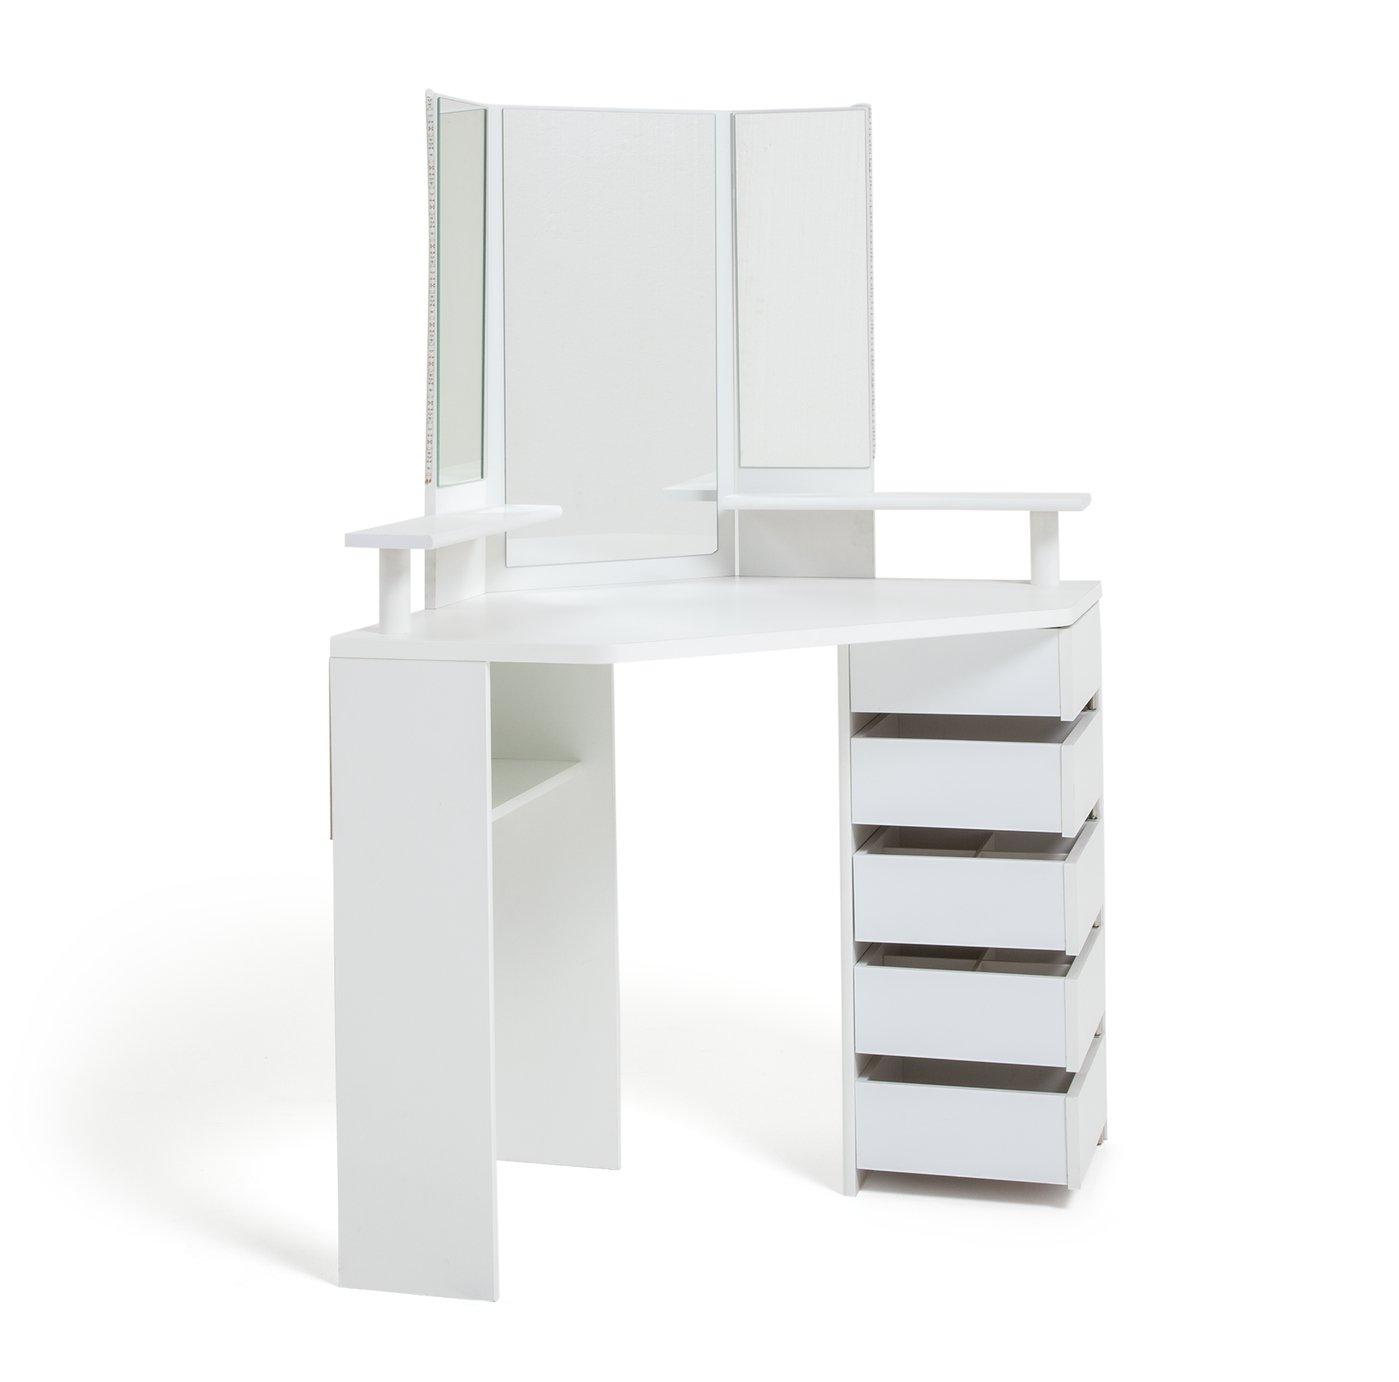 Argos Home Heathland Dressing Table - White